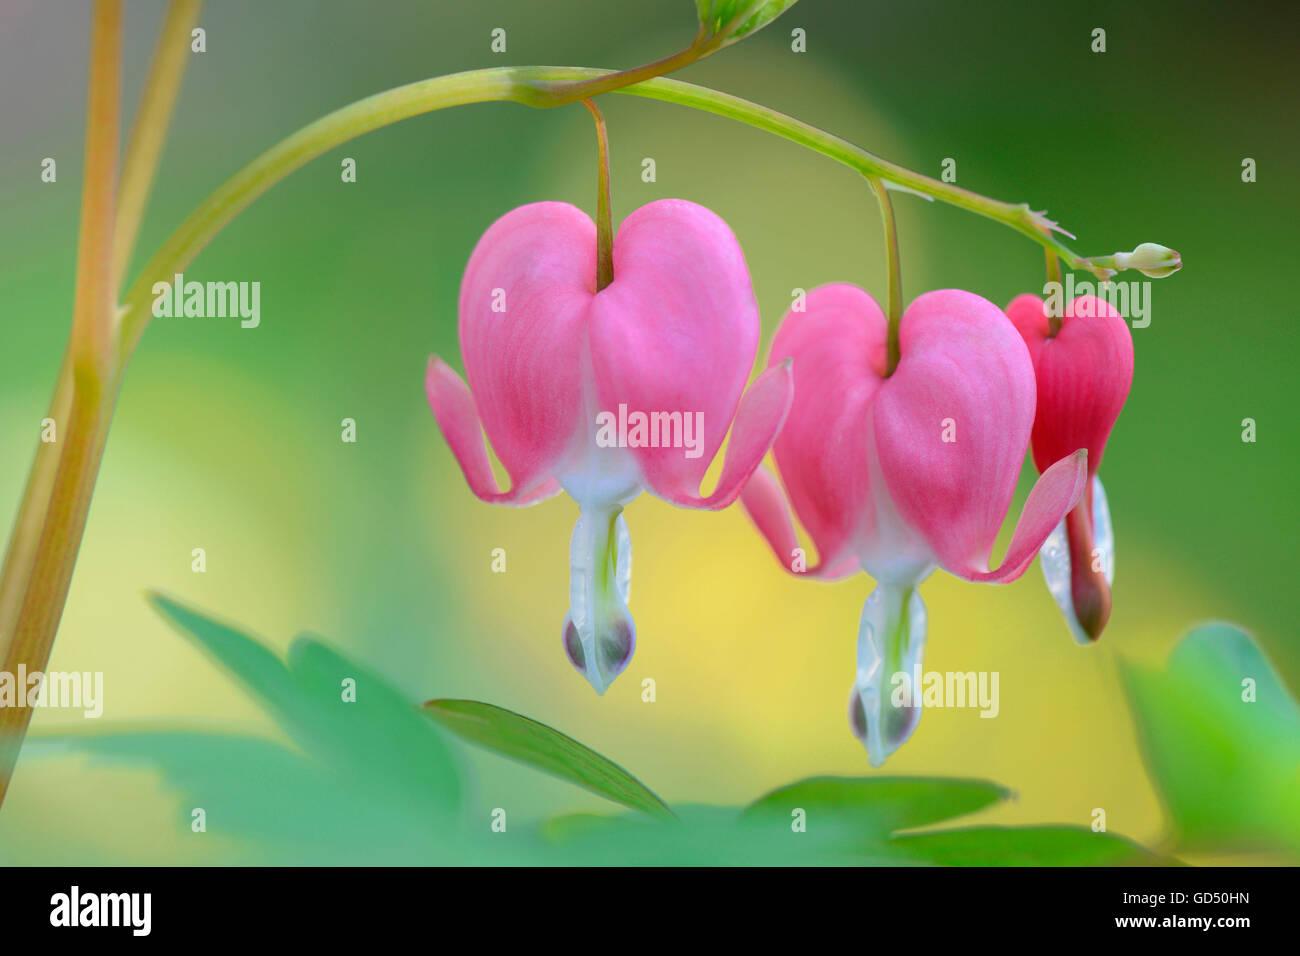 Traenendes Herz / (Dicentra spectabilis), Pflanzen - Stock Image